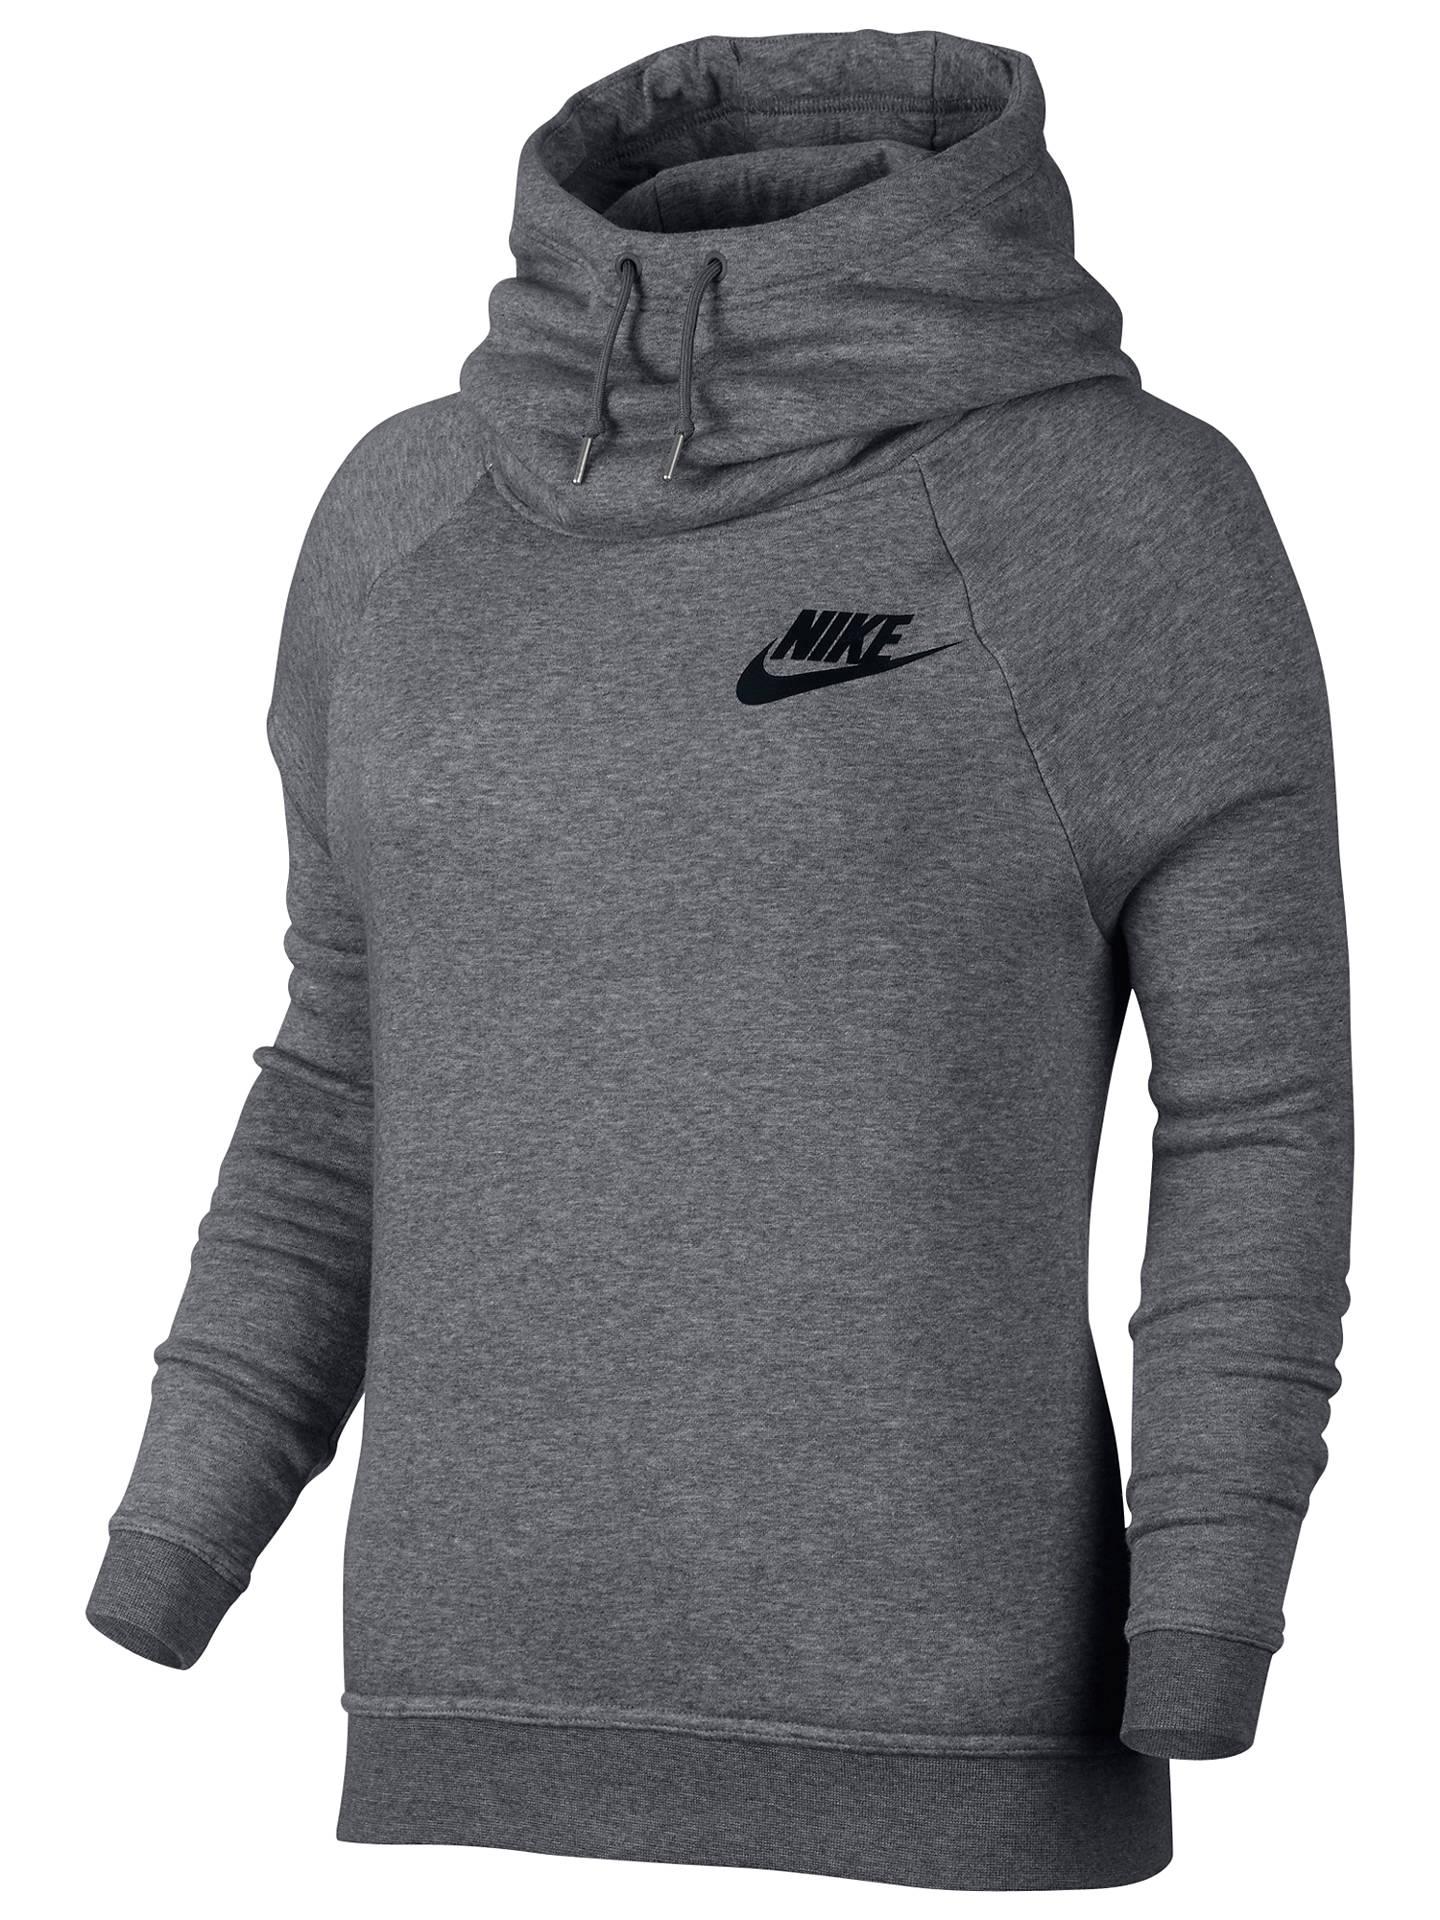 John Rally HoodieCarbon Sportswear At Heatherblack Nike Lewis OZuiPkXT